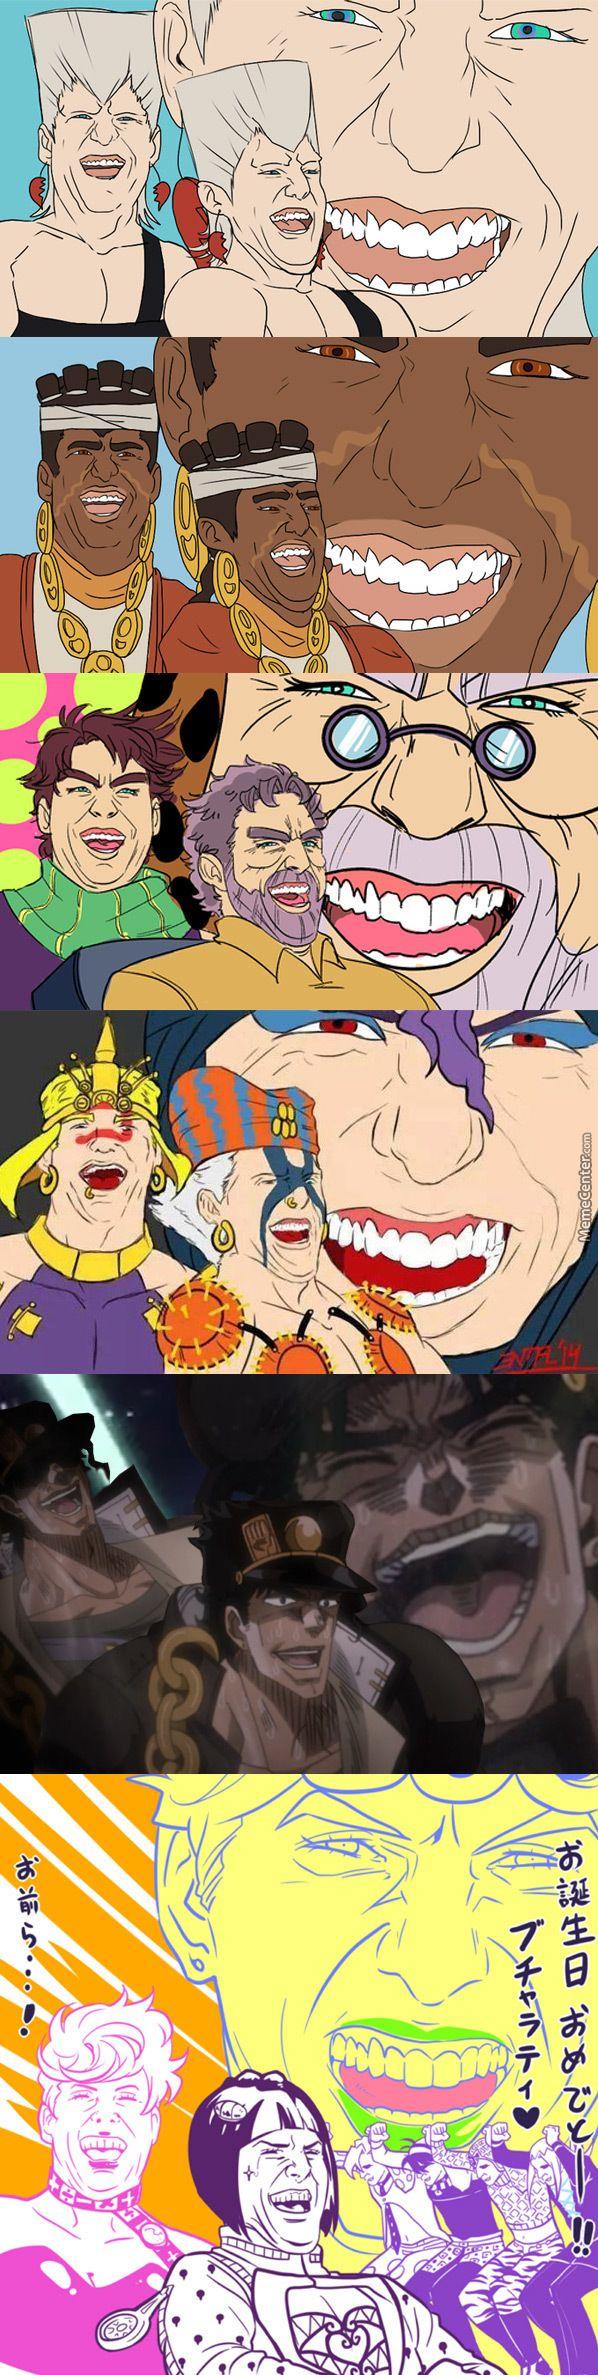 Tom Cruise Laughing X Jojo'S Bizarre Adventure